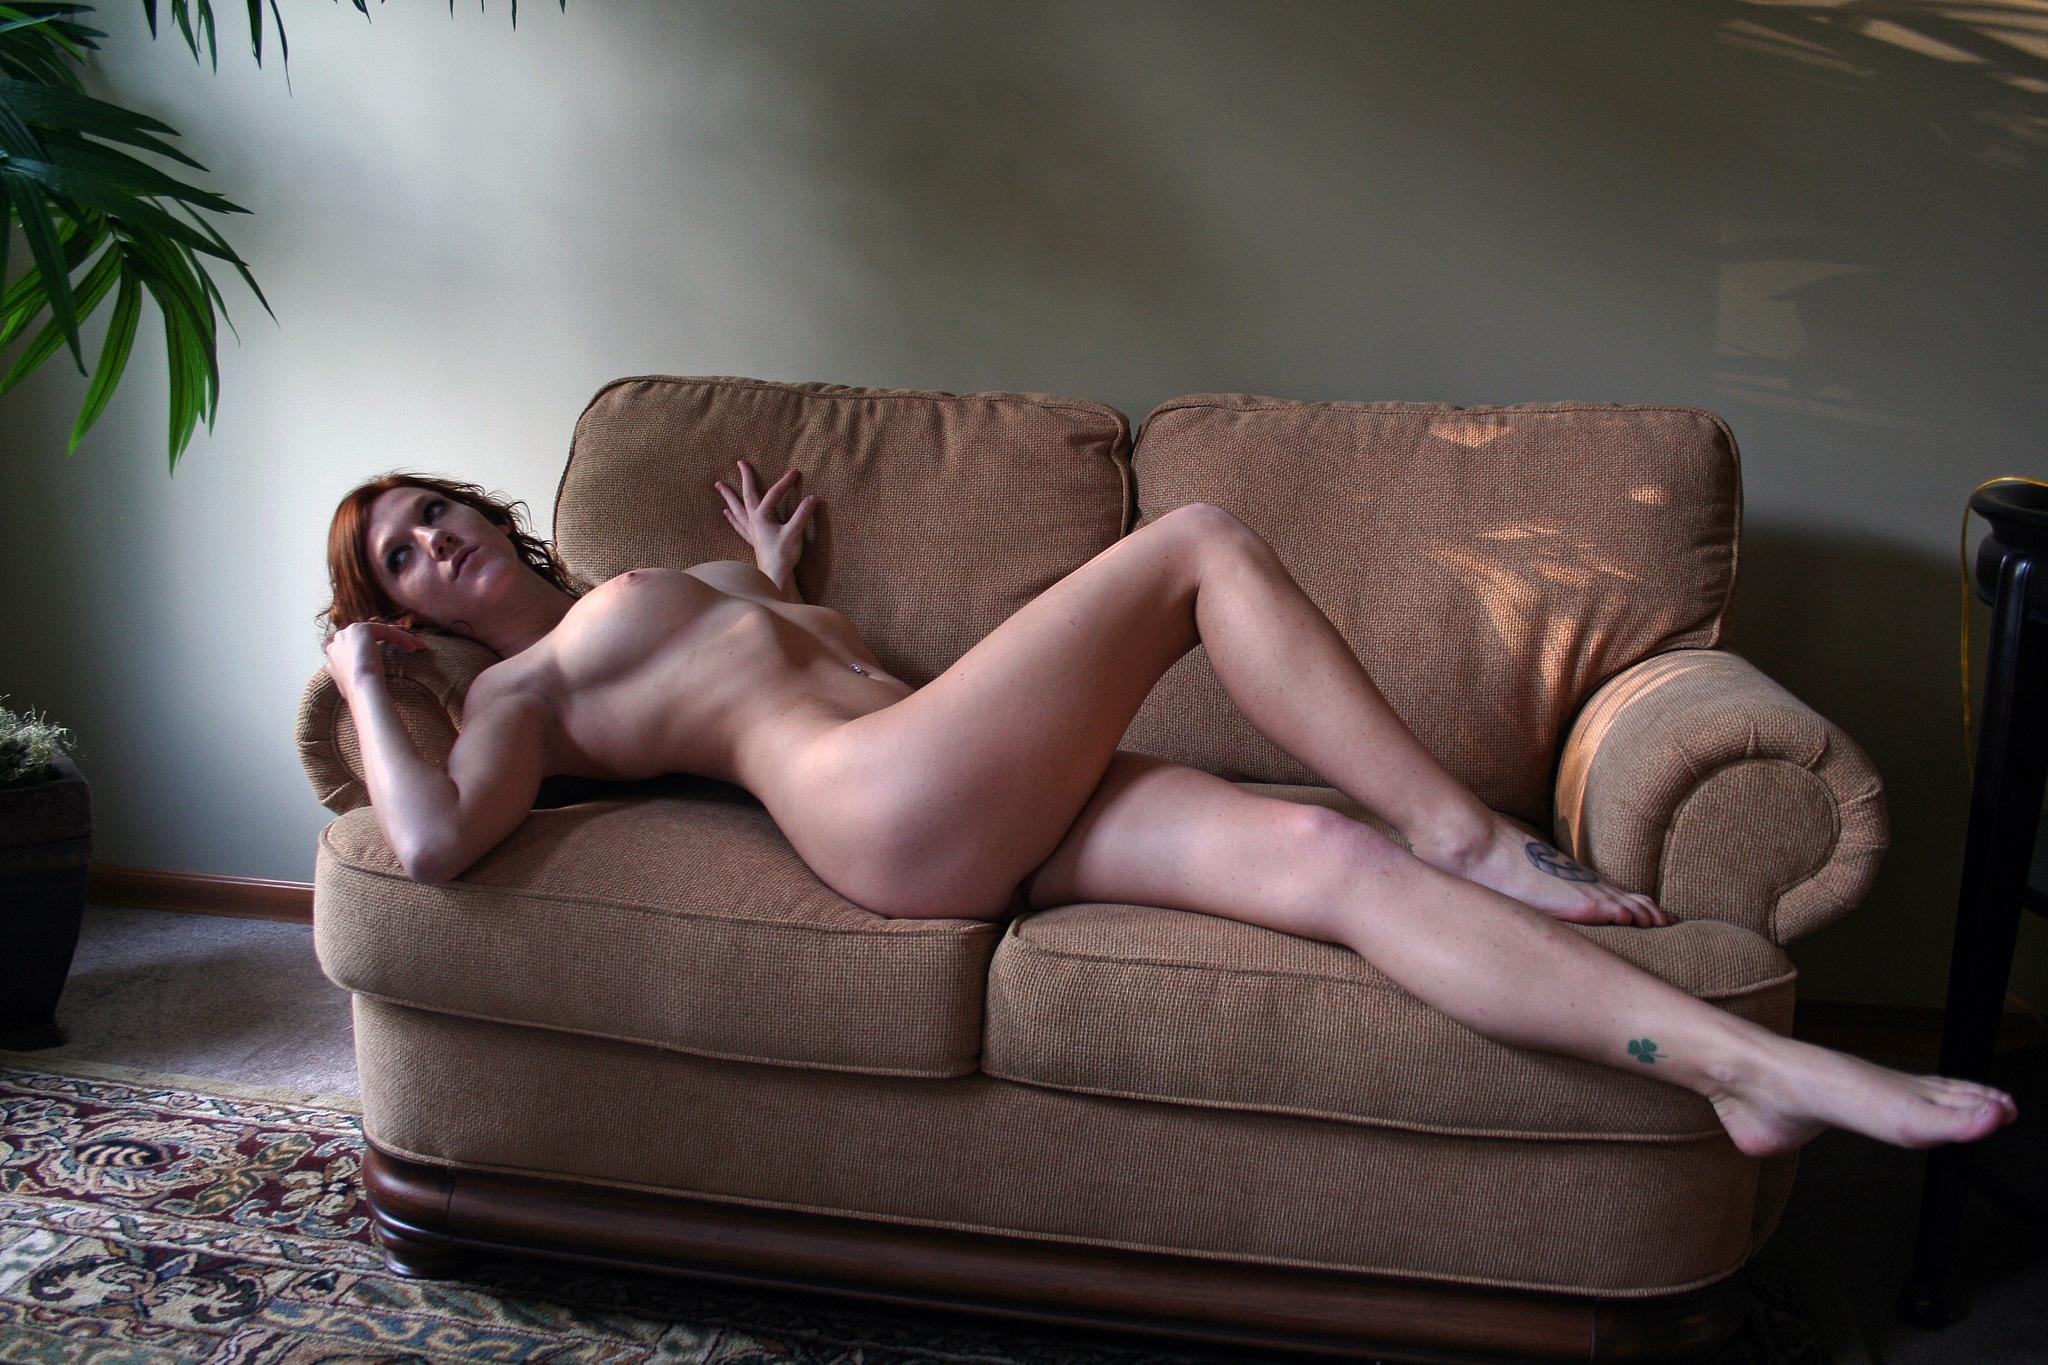 Amelia Rose Porn miss amelia roserobertlperson on youpic